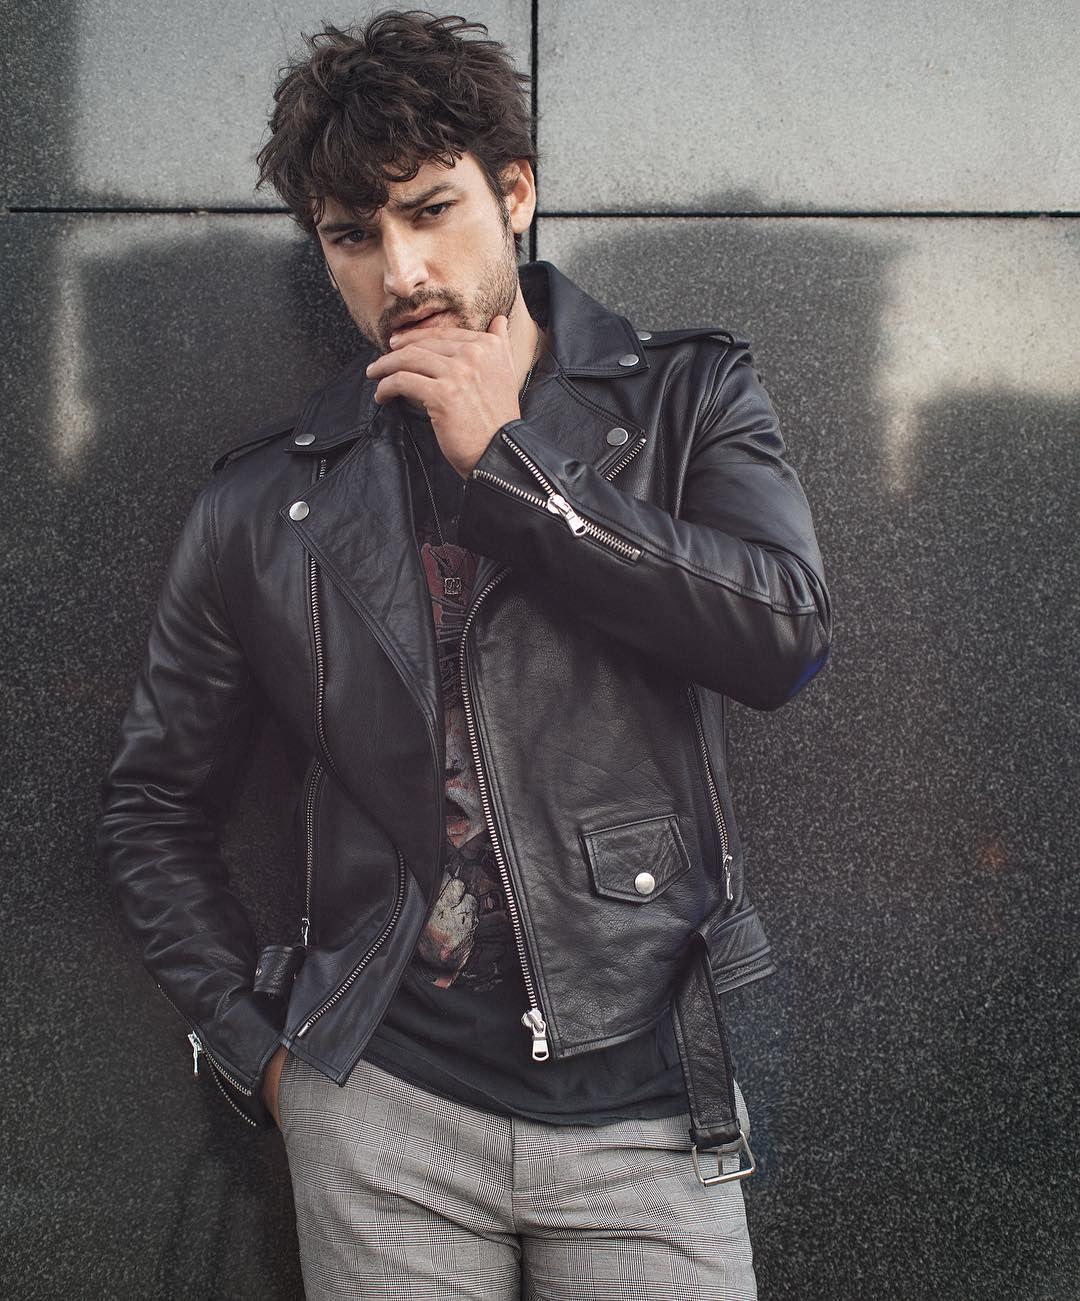 Pin By Aracely Carranco On Alp Leather Jeans Men Vogue Men Leather Jacket Men [ 1301 x 1080 Pixel ]